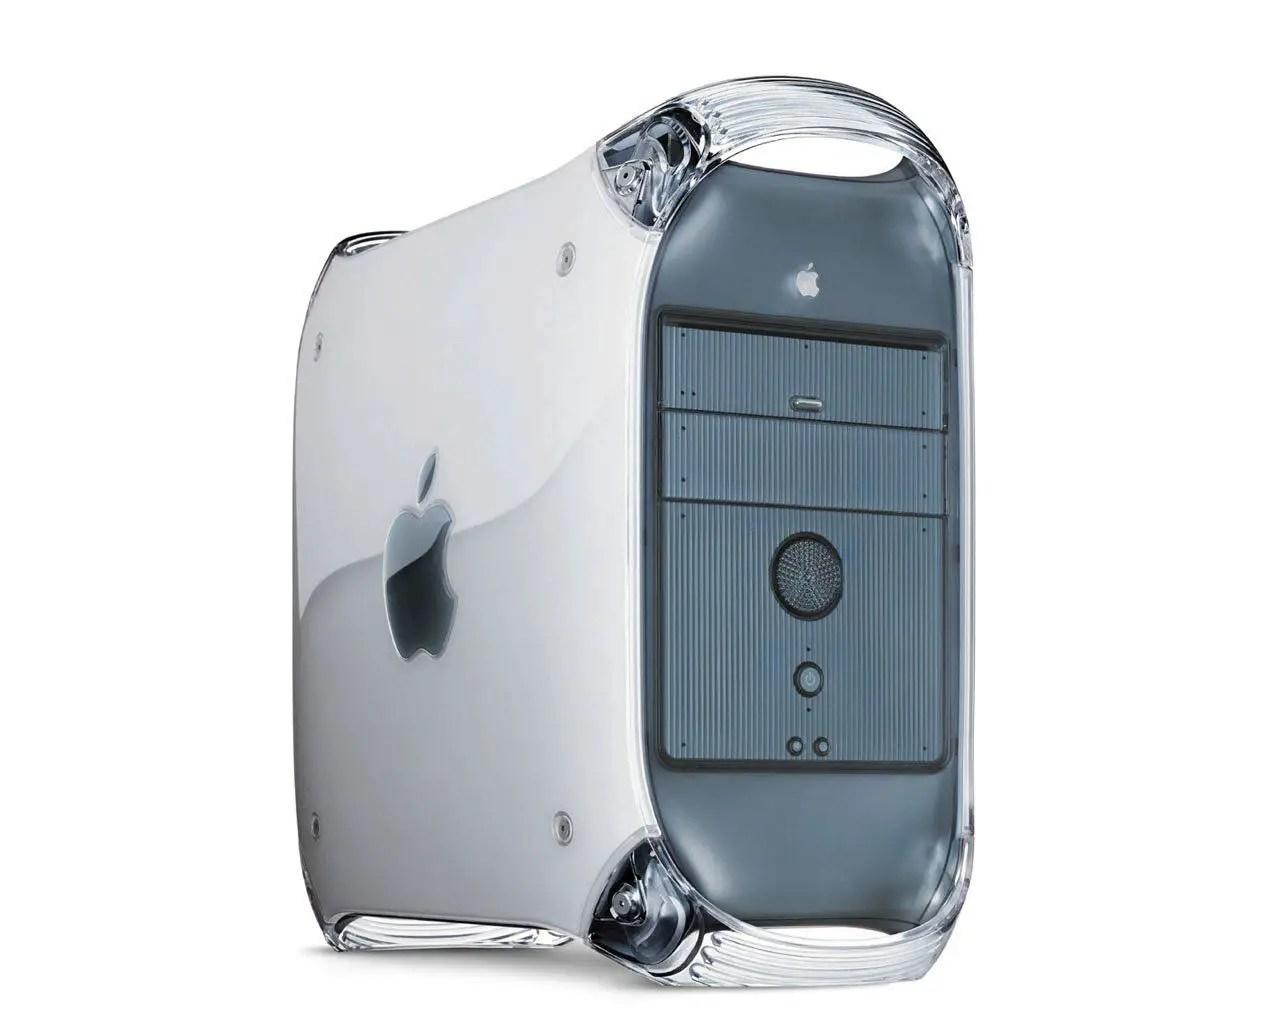 Macintosh Server G4